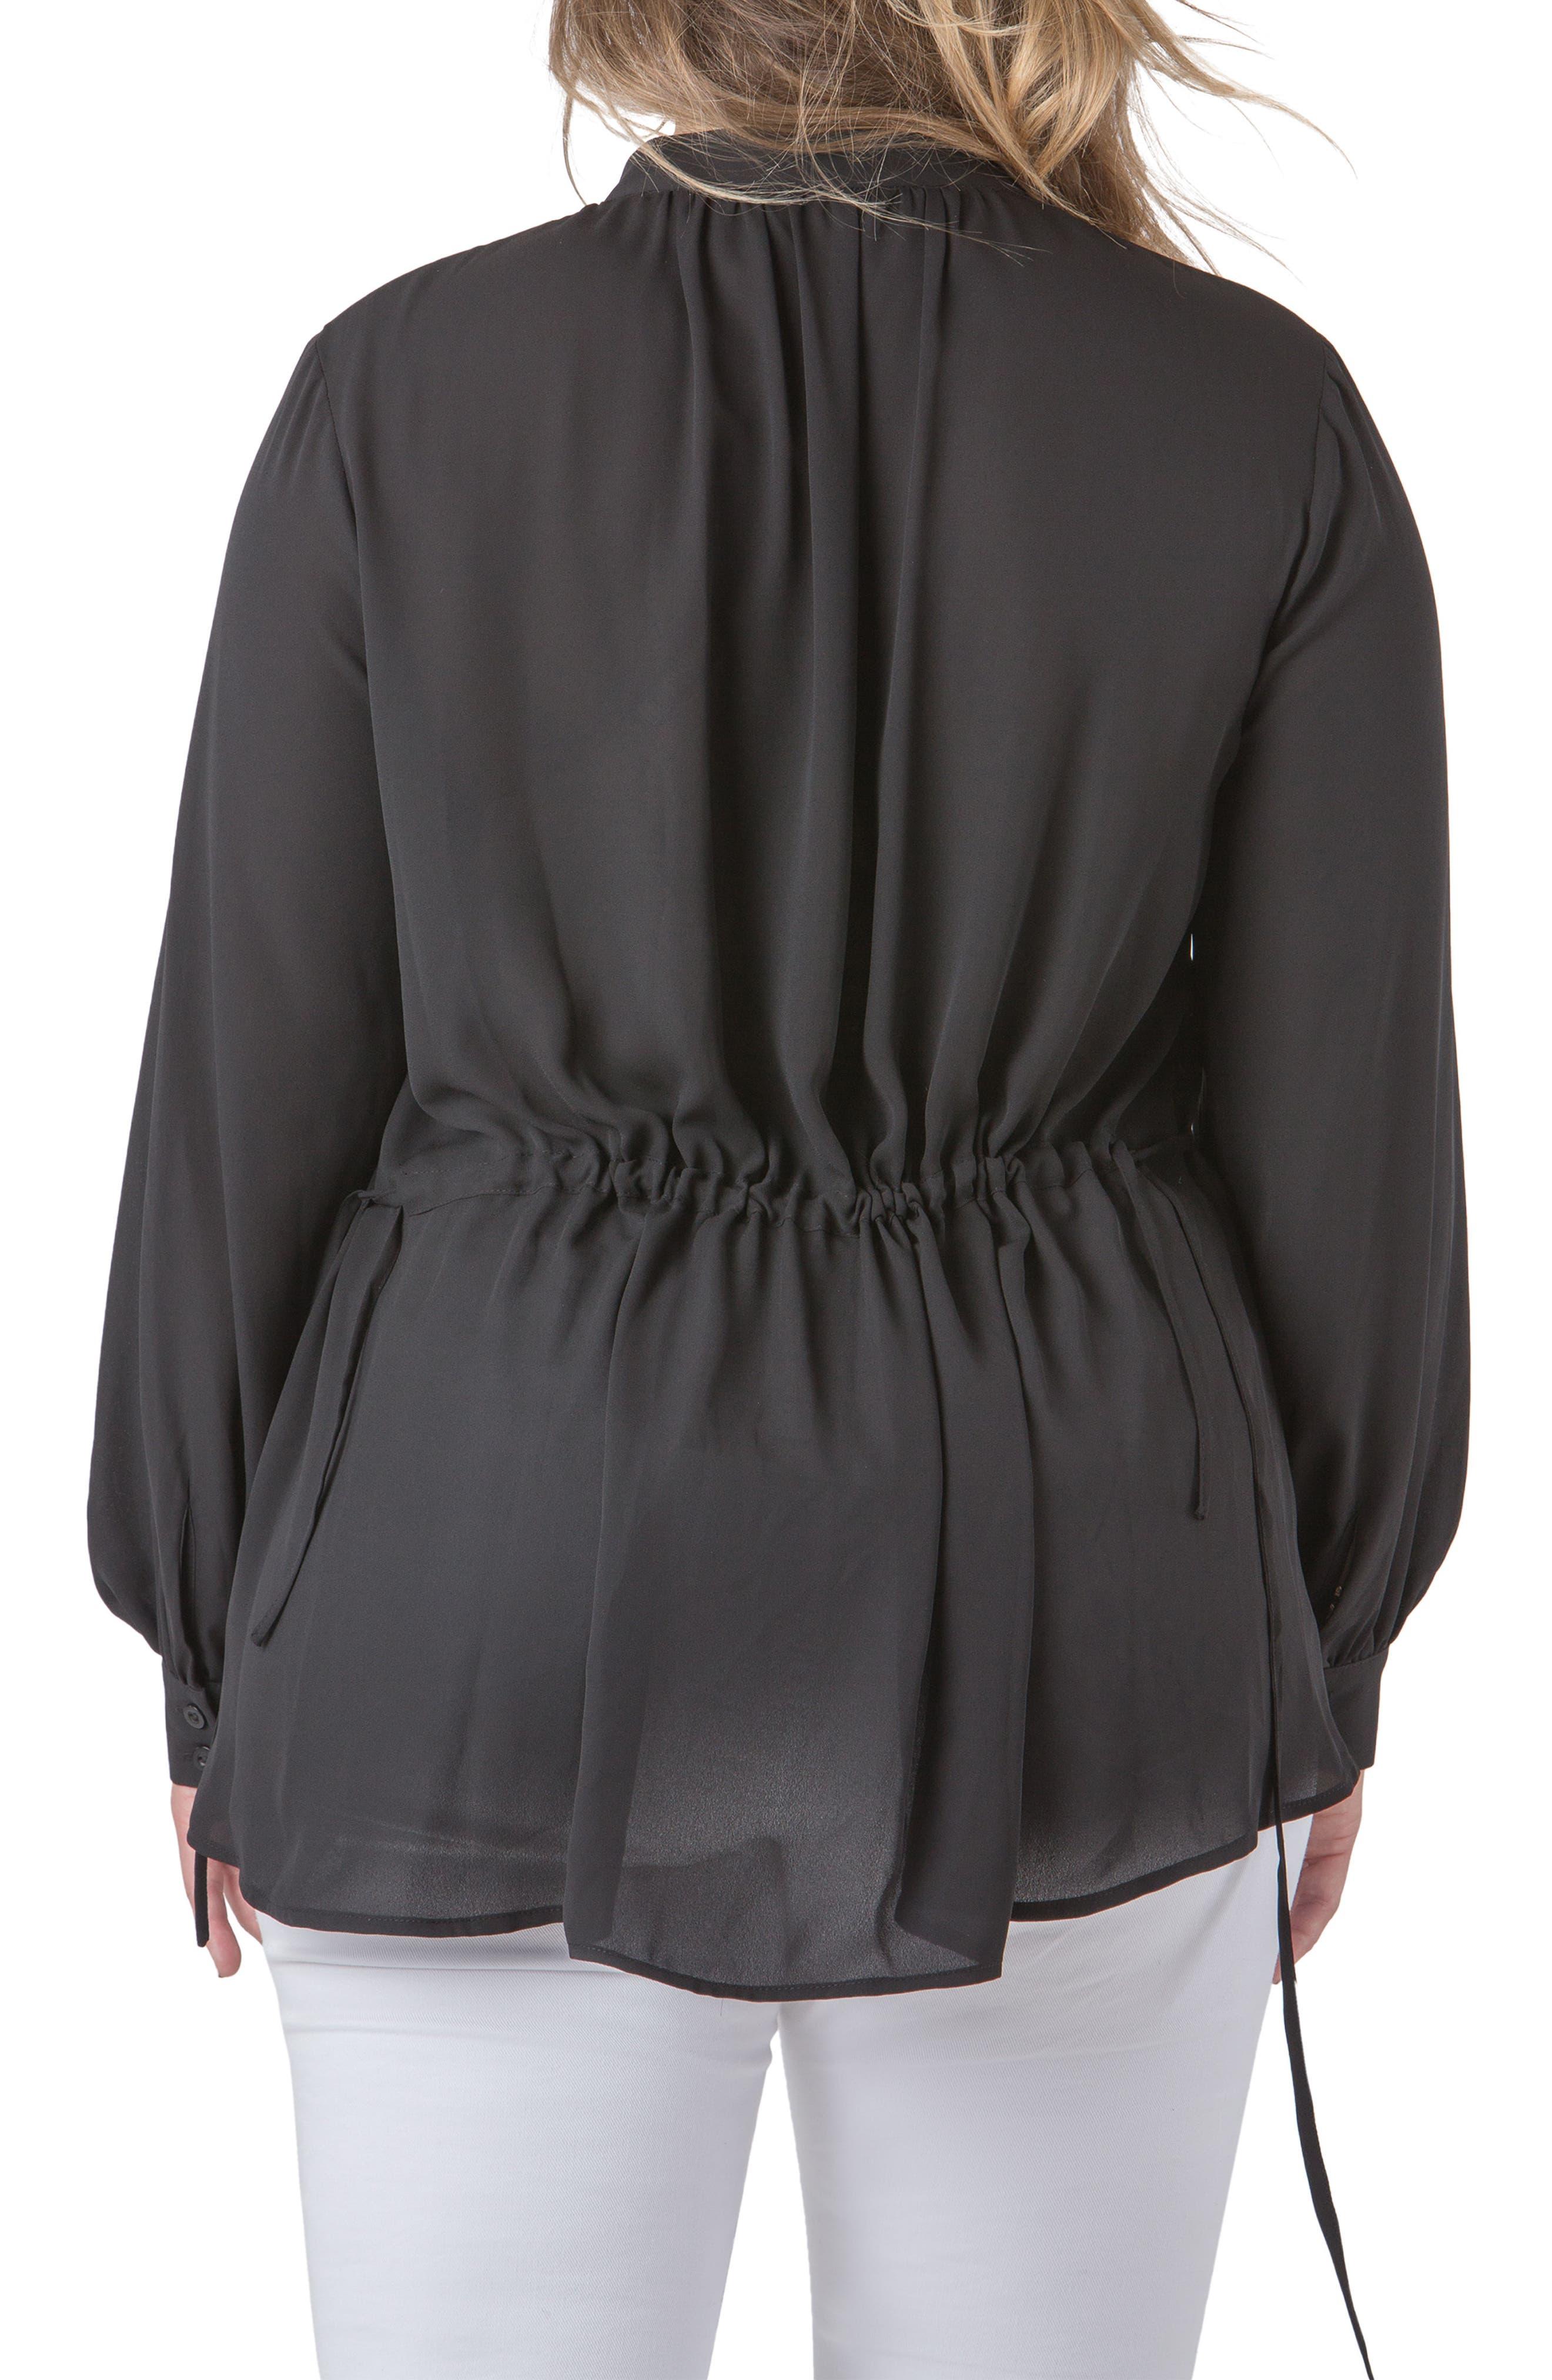 STANDARDS & PRACTICES, Trisha Tuxedo Front Chiffon Blouse, Alternate thumbnail 2, color, BLACK